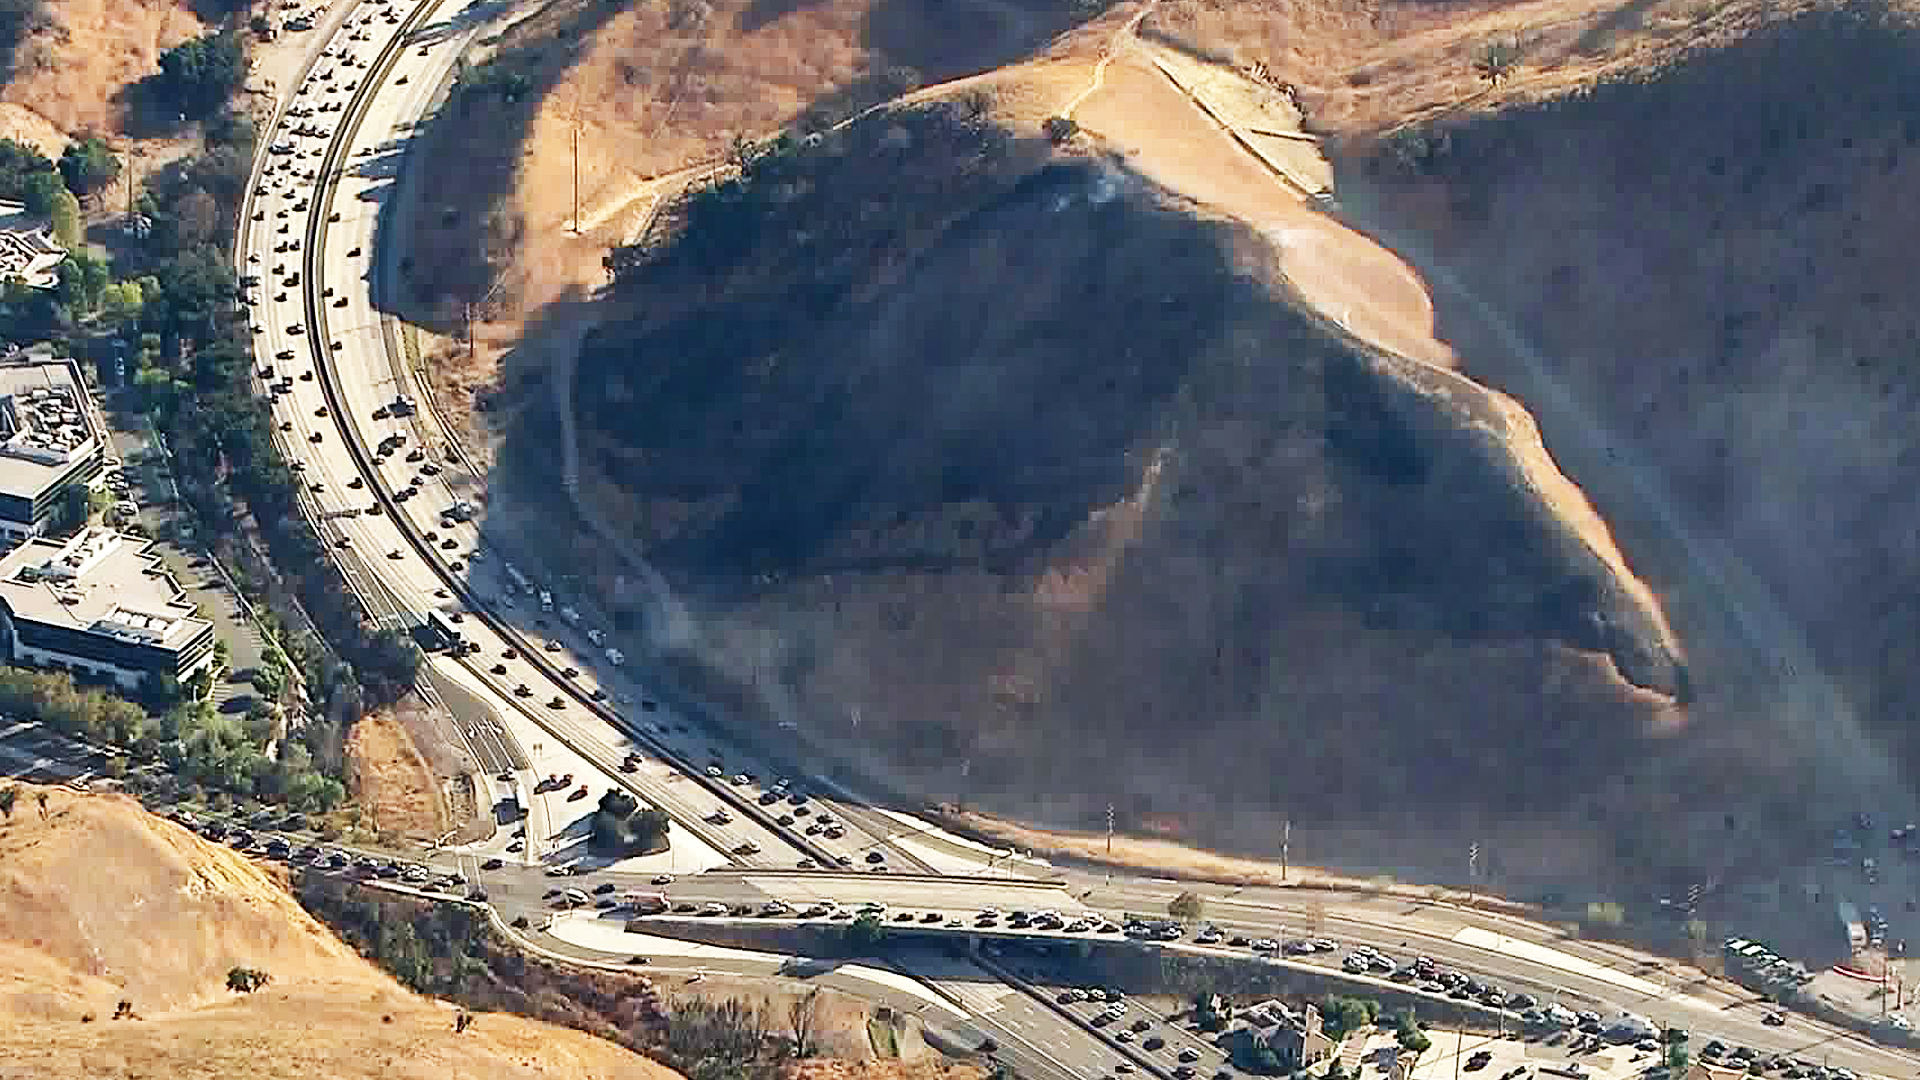 10 Acre Oak Fire Prompts Closure Of 101 Freeway Ramps In Calabasas Ktla